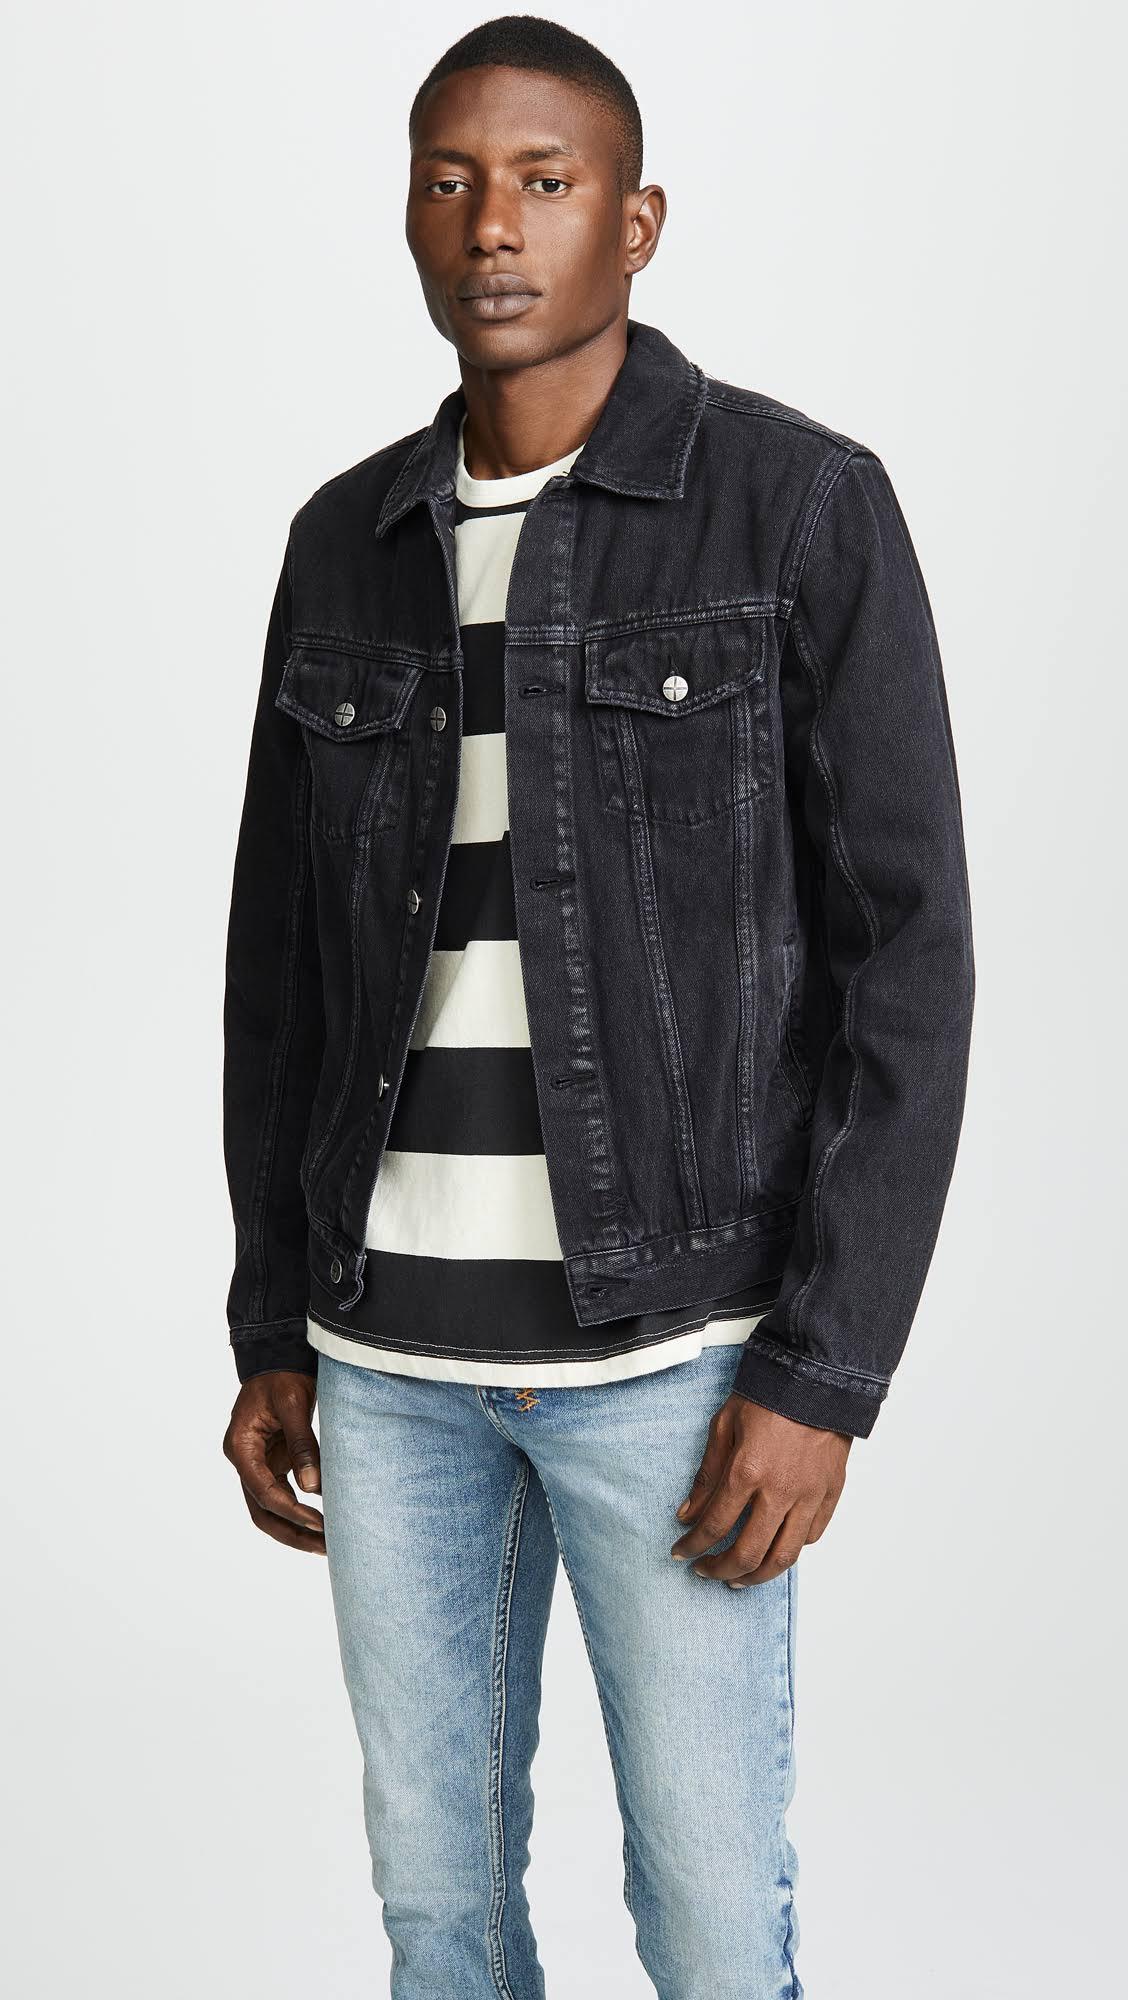 Jacket Jacket Ksubi Denim Ksubi Black Denim Black Ksubi Jacket Jacket Black Ksubi Denim Ksubi Denim Black Denim Jacket rA5qRAwa